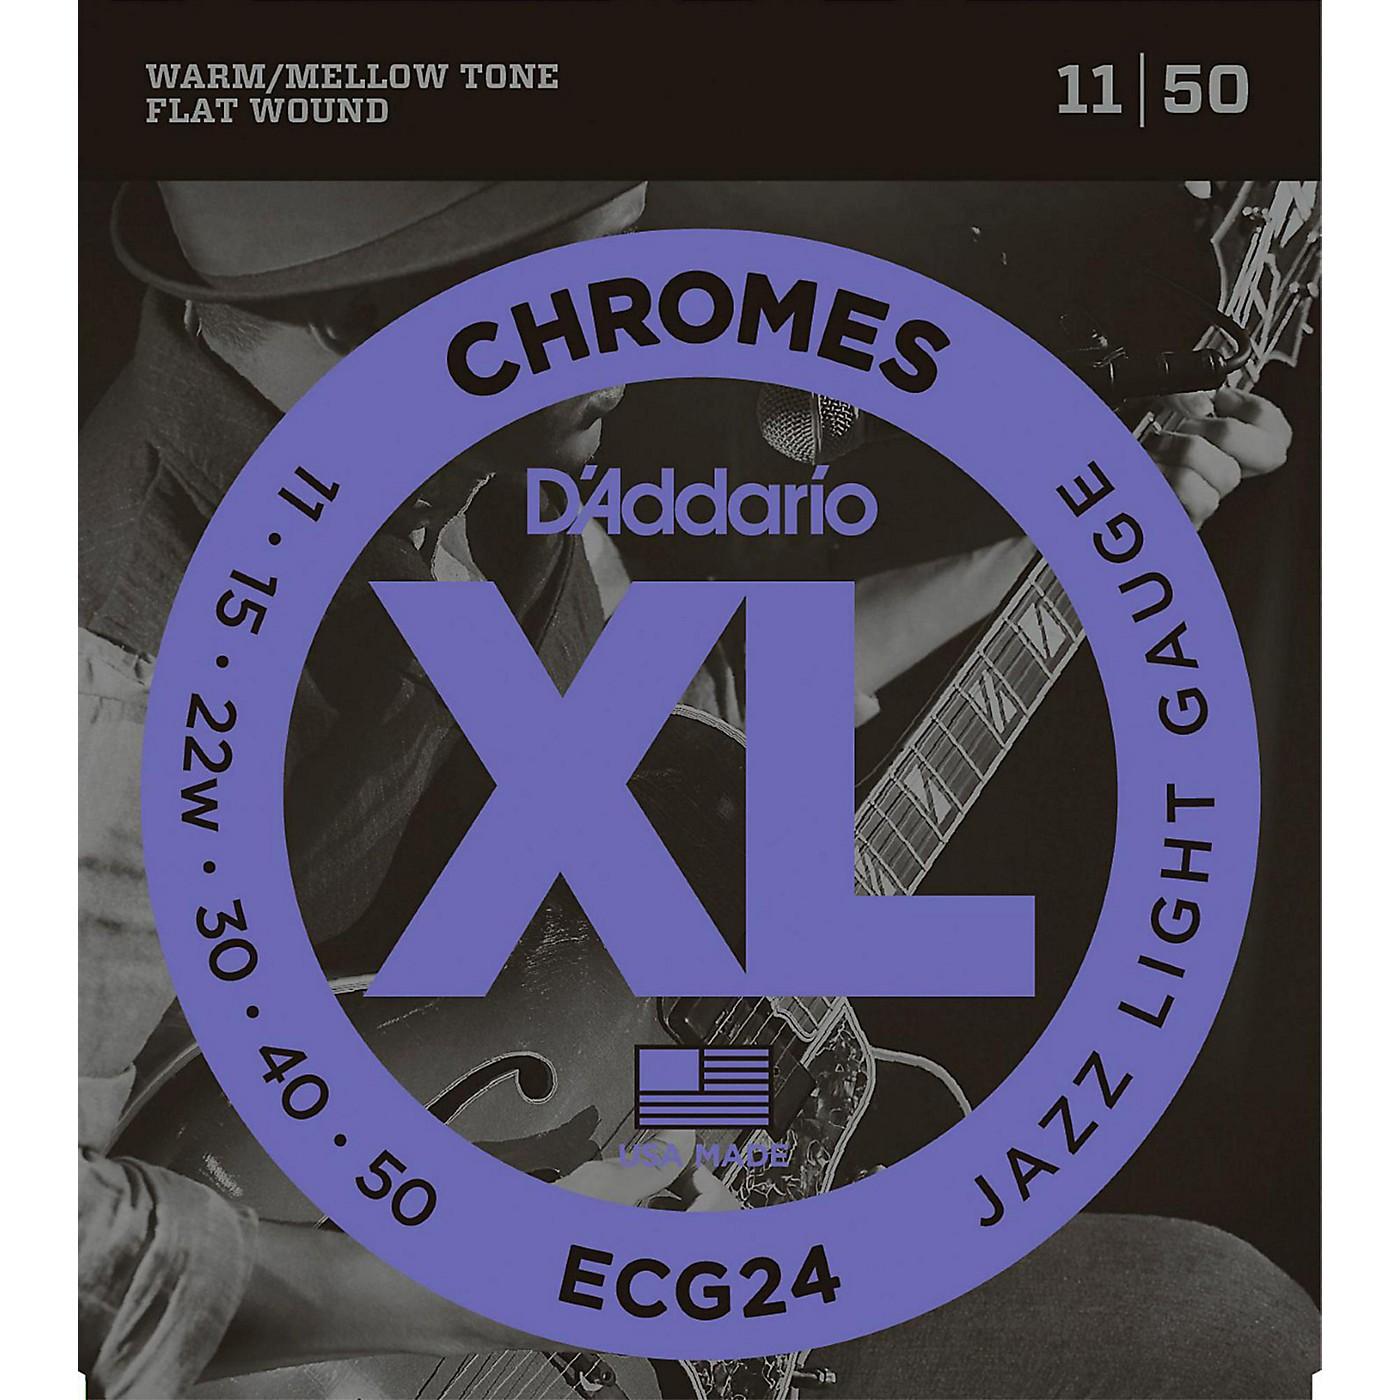 D'Addario XL Chromes Jazz Light Electric Guitar Strings ECG24 Flatwound thumbnail